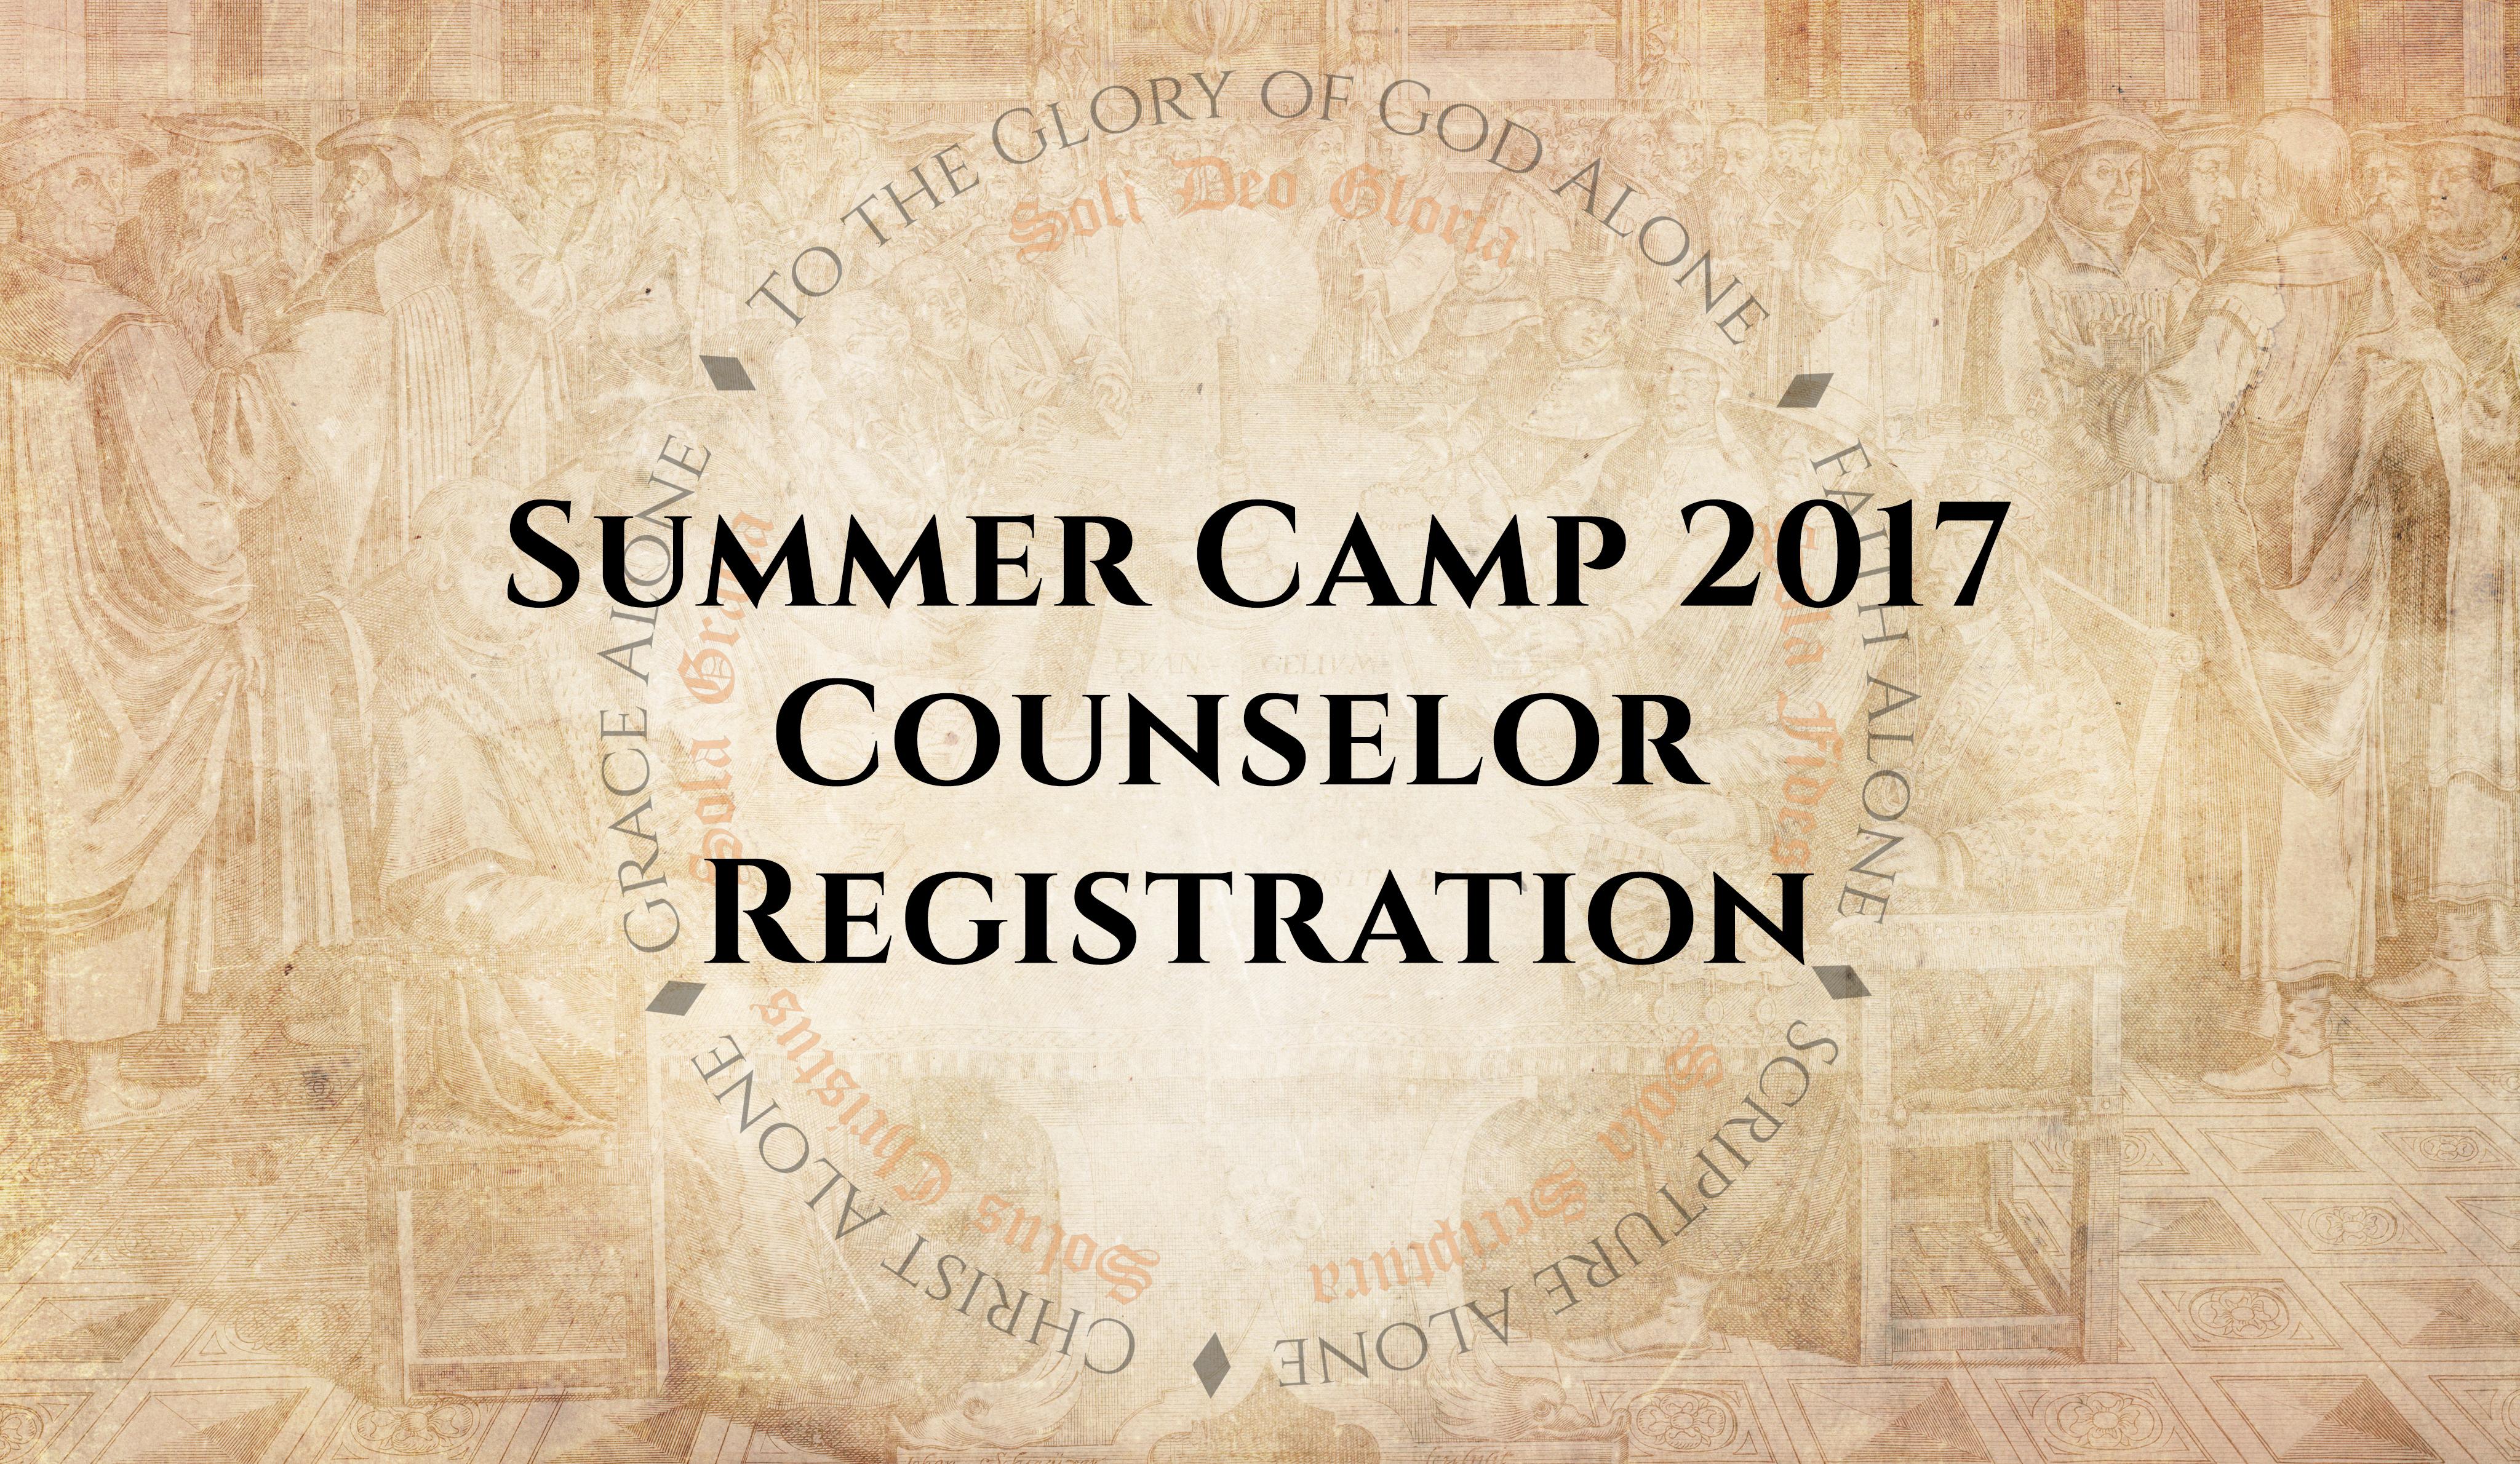 Counselor registration